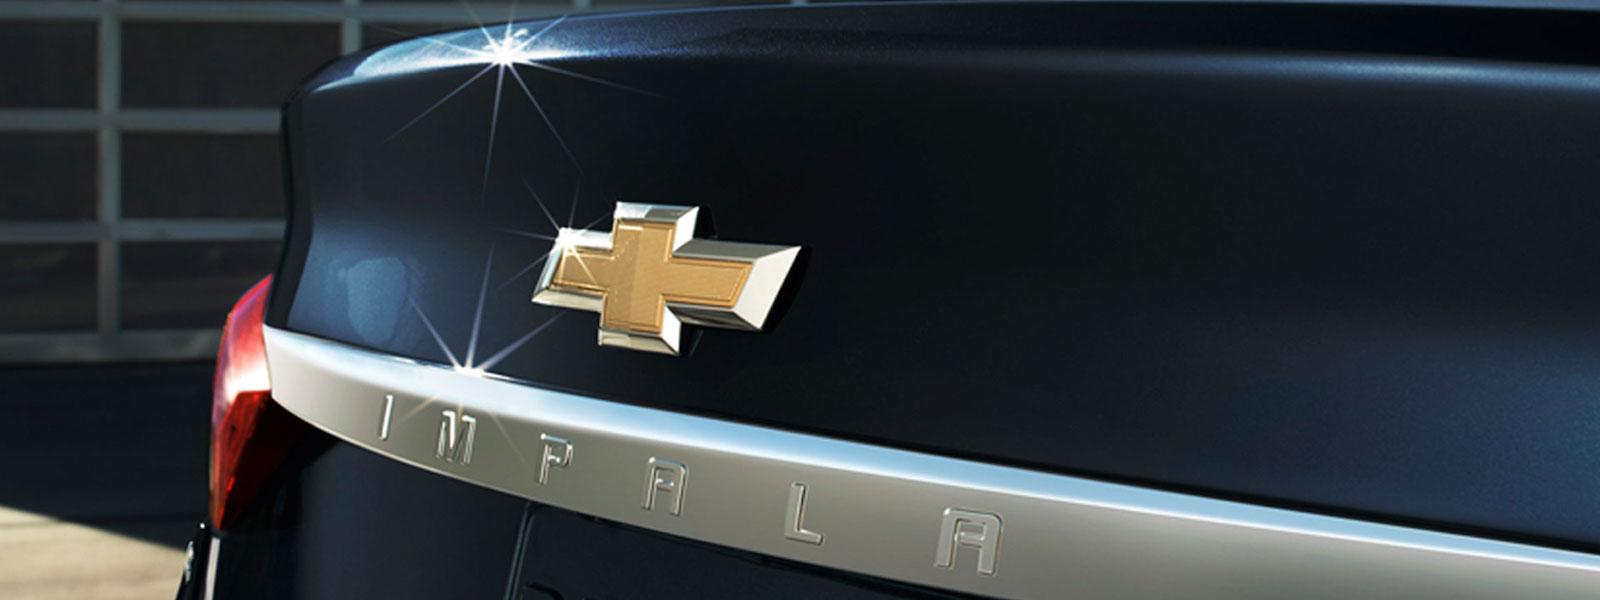 2016 Chevy Impala Style